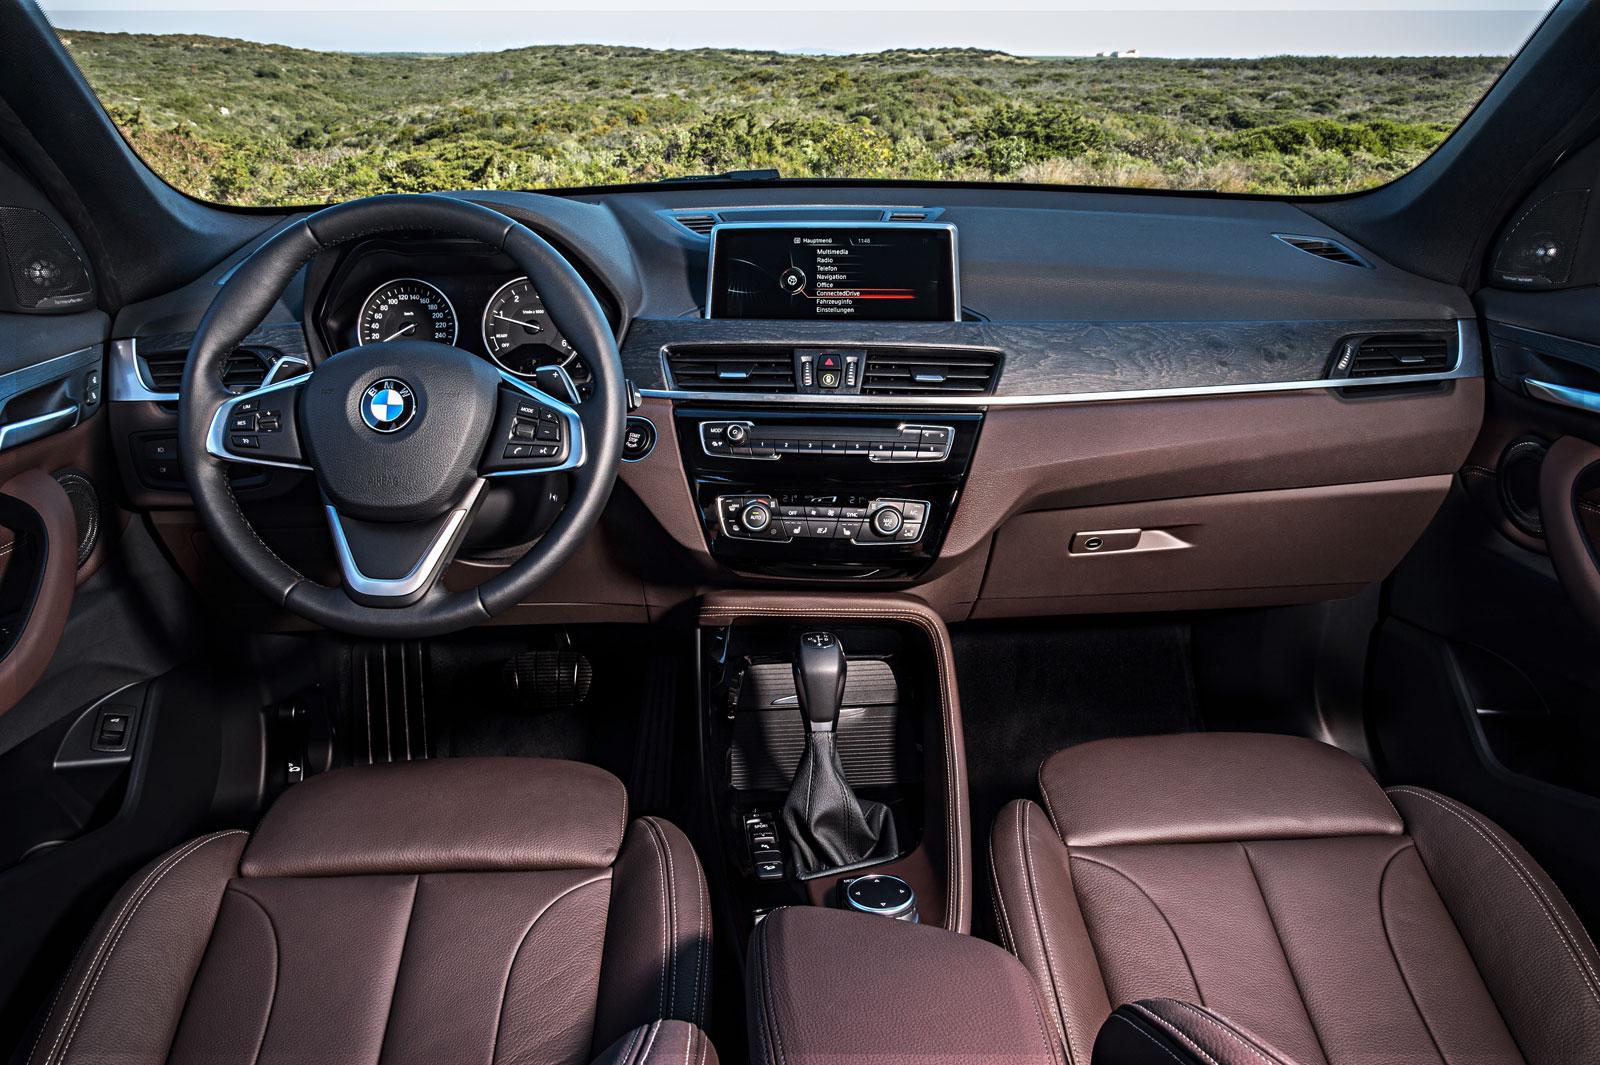 2016 Bmw X1 Interior Car Body Design